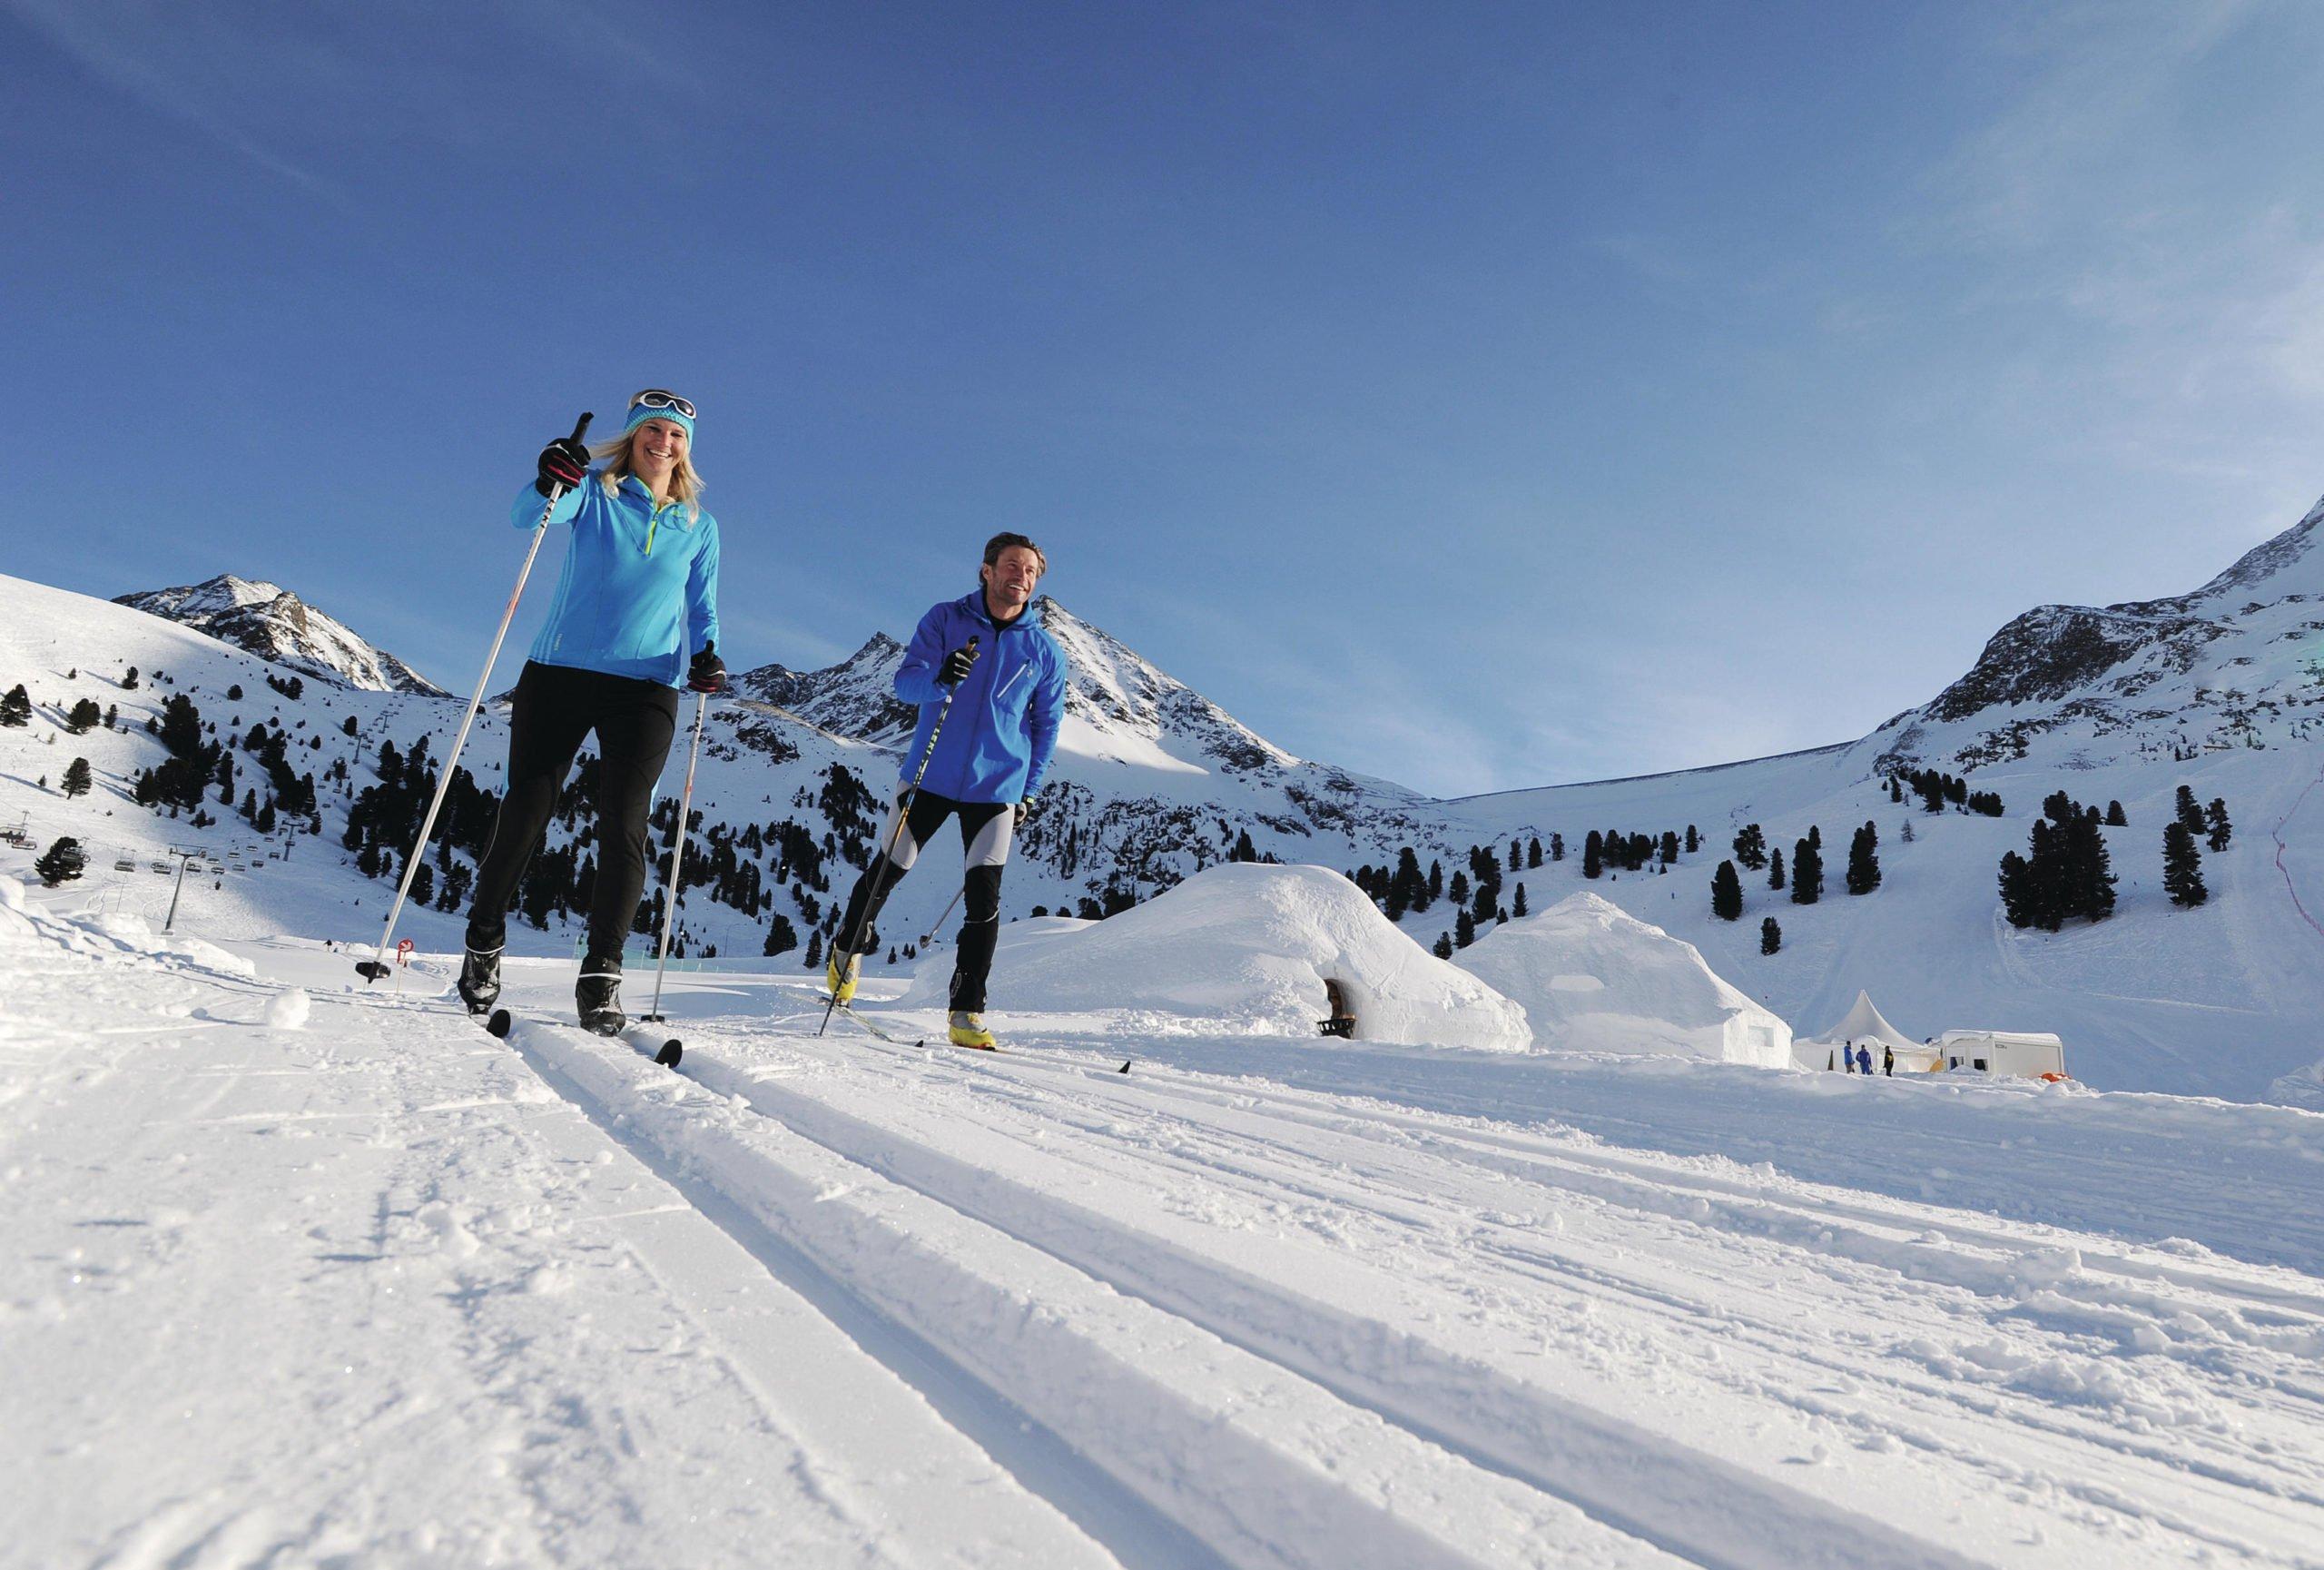 Nordic Ski Things To Do in Innsbruck